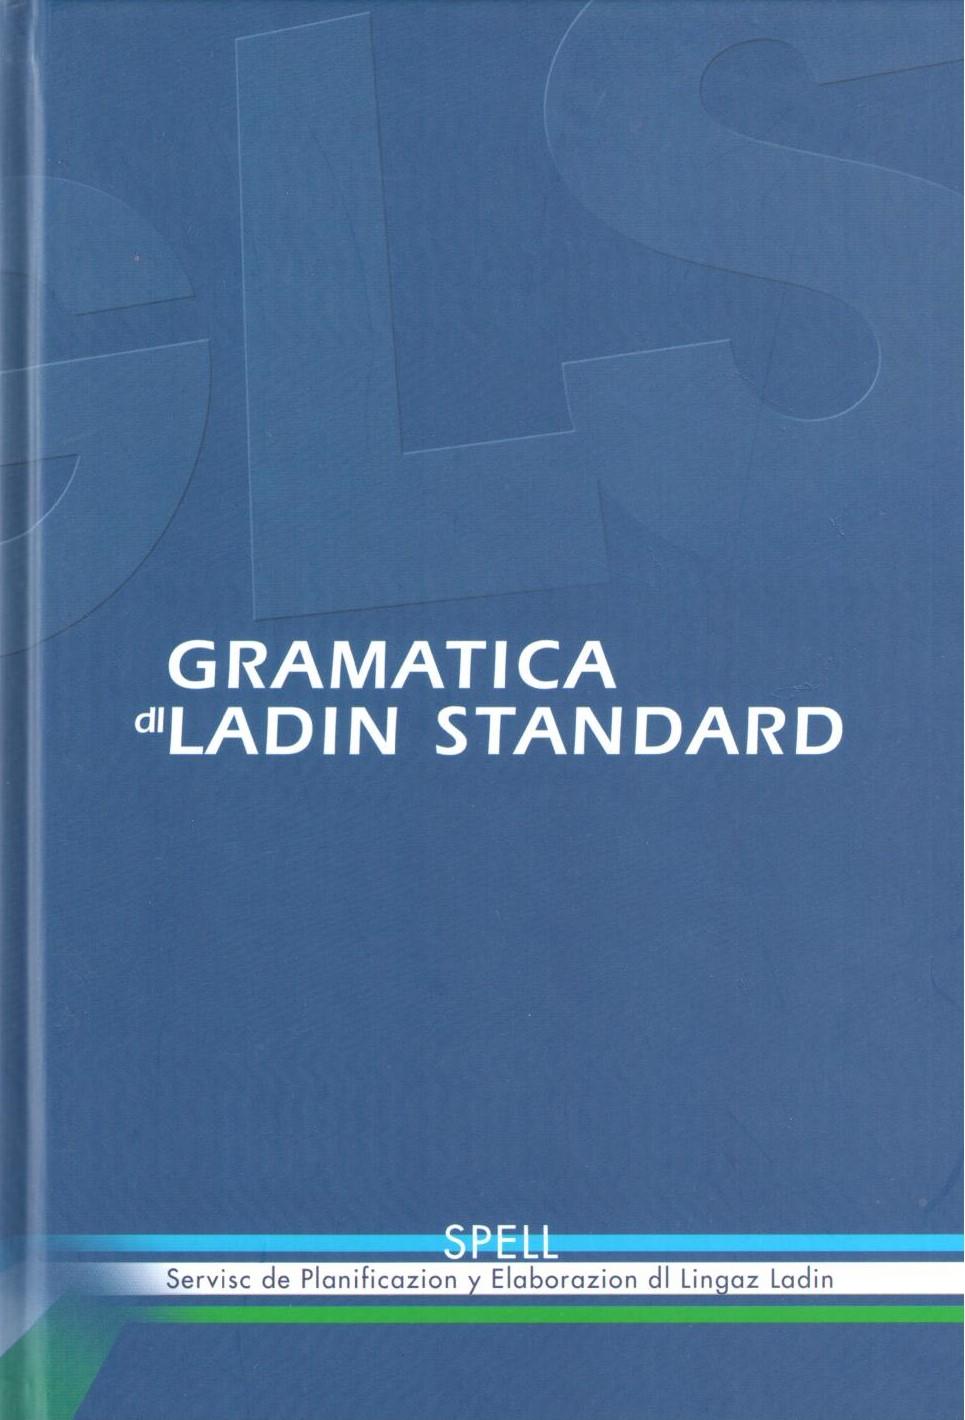 Gramatica dl ladin standard, SPELL, Servisc de Planificazion y Elaborazion dl Lingaz Ladin